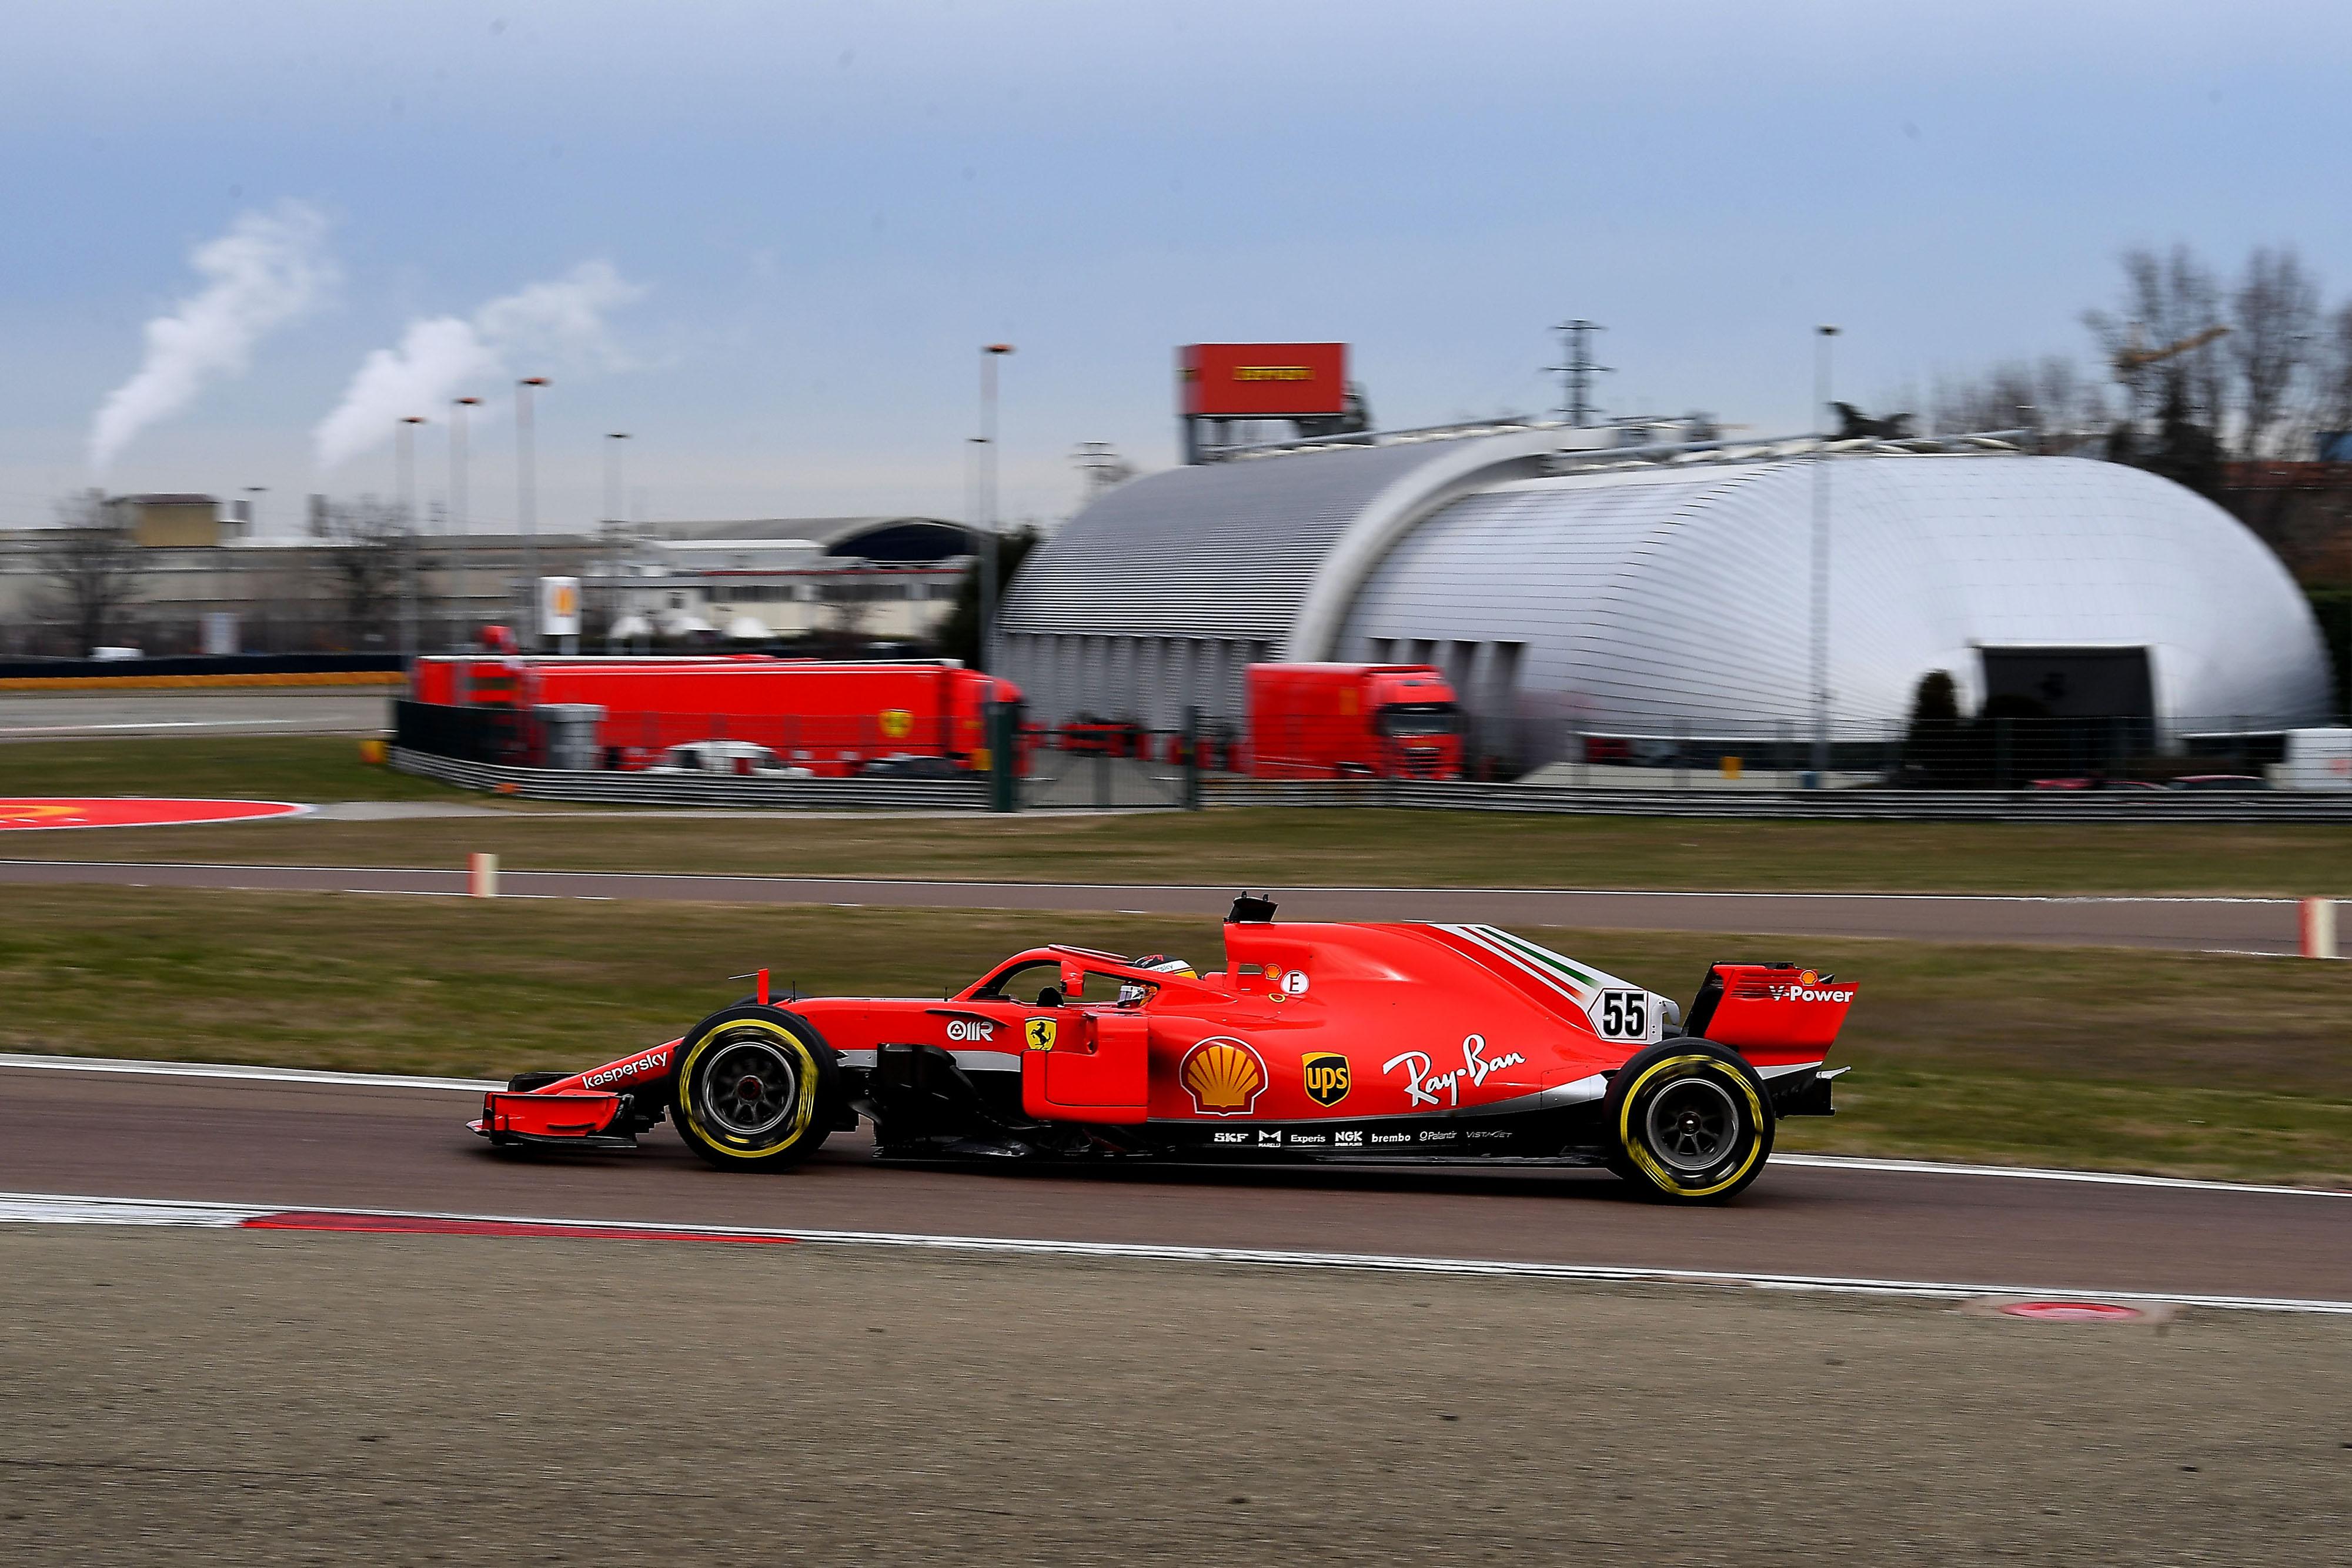 F1 TEST FIORANO - MERCOLEDì  27/01/21 - CARLOS SAINZ   credit: @Scuderia Ferrari Press Office